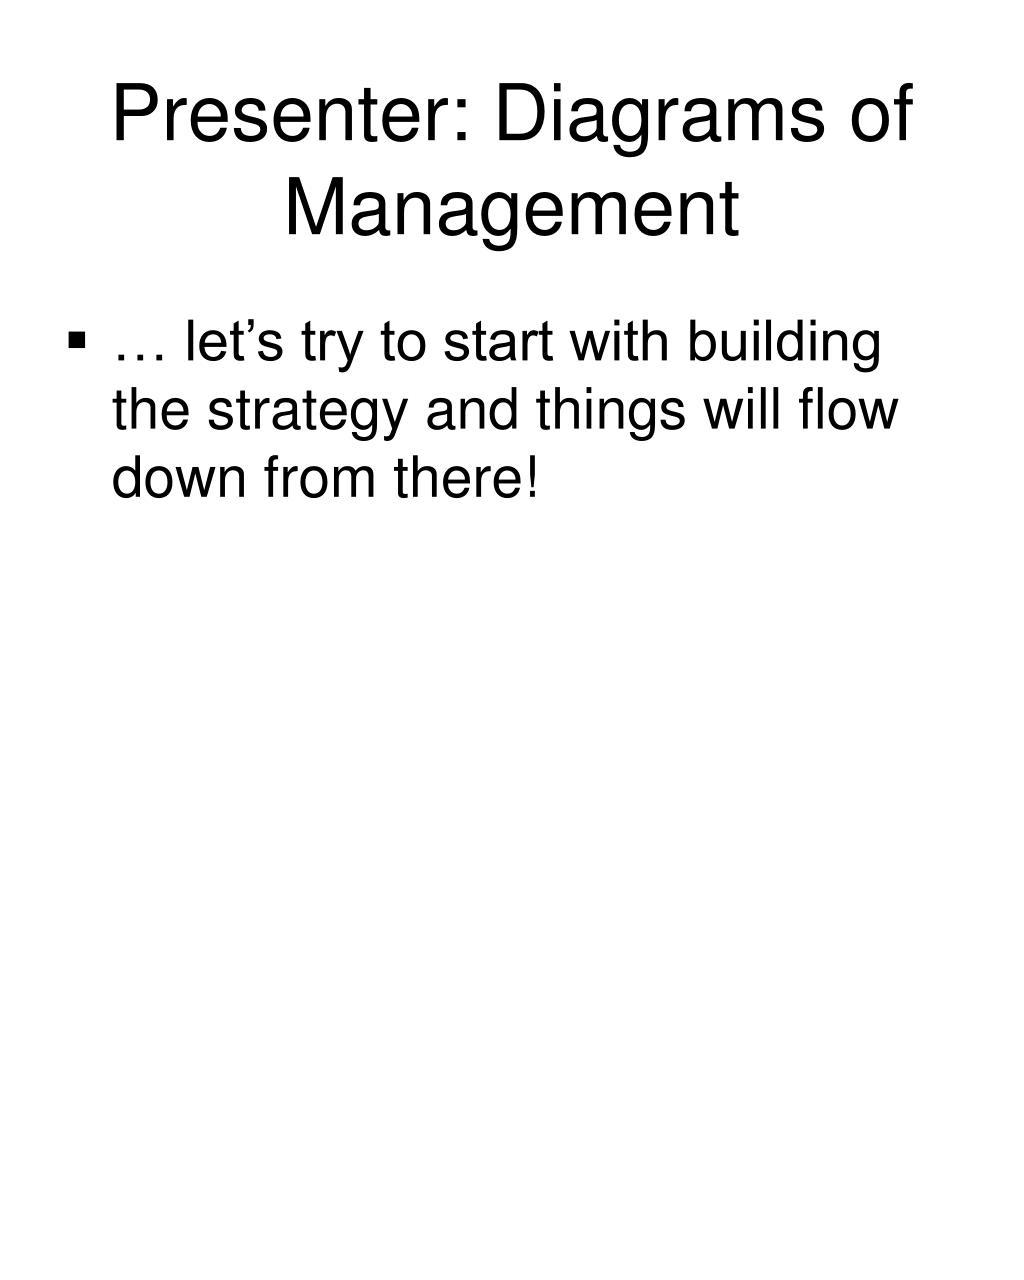 Presenter: Diagrams of Management